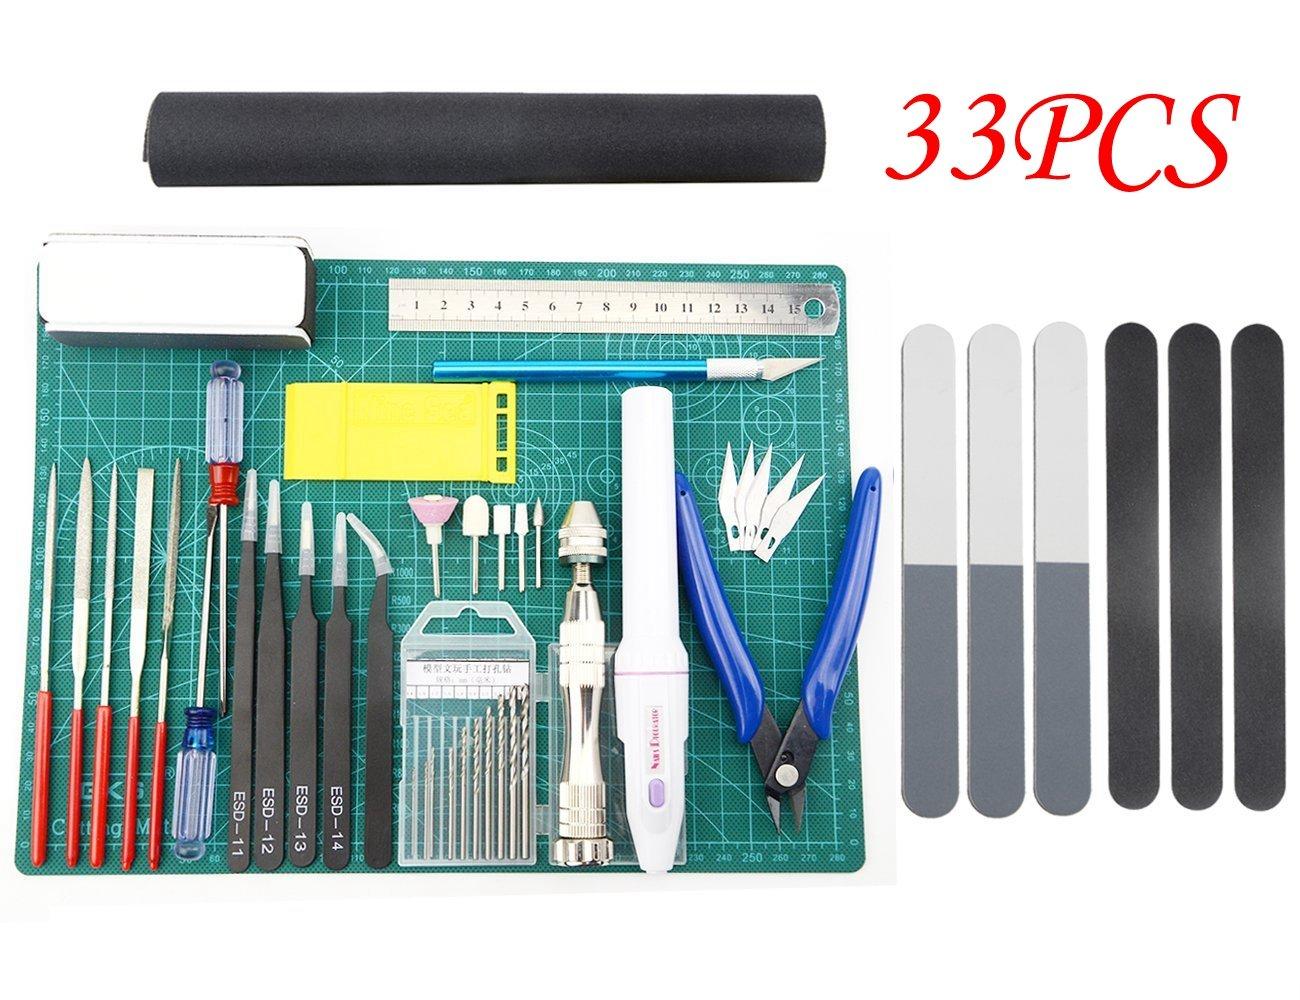 BXQINLENX Professional 35 PCS Gundam Modeller Basic Tools Craft Set For Car Aeroplane Building Model Assemble Building(J)   B071CZ7V4K